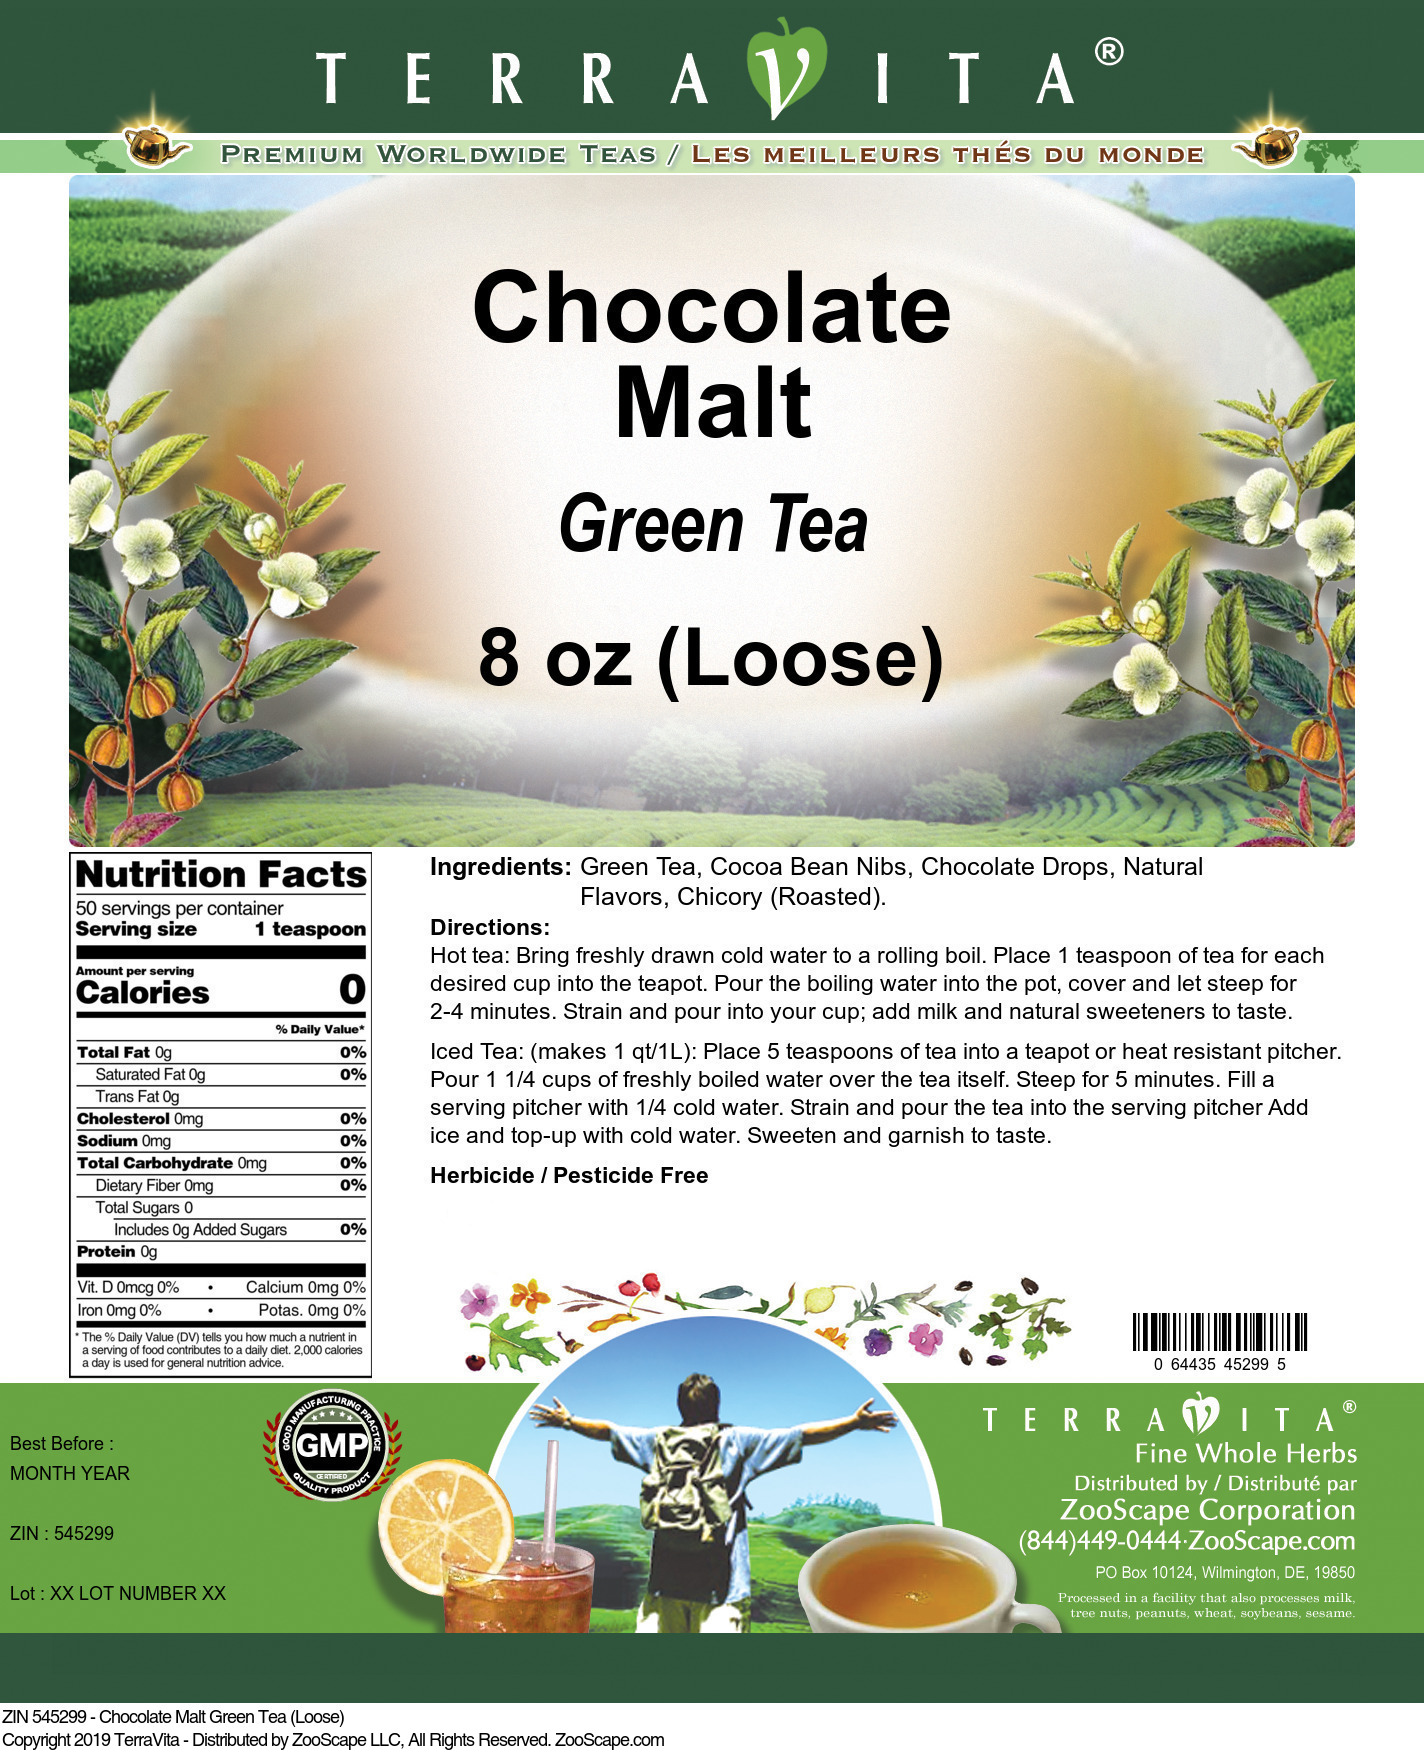 Chocolate Malt Green Tea